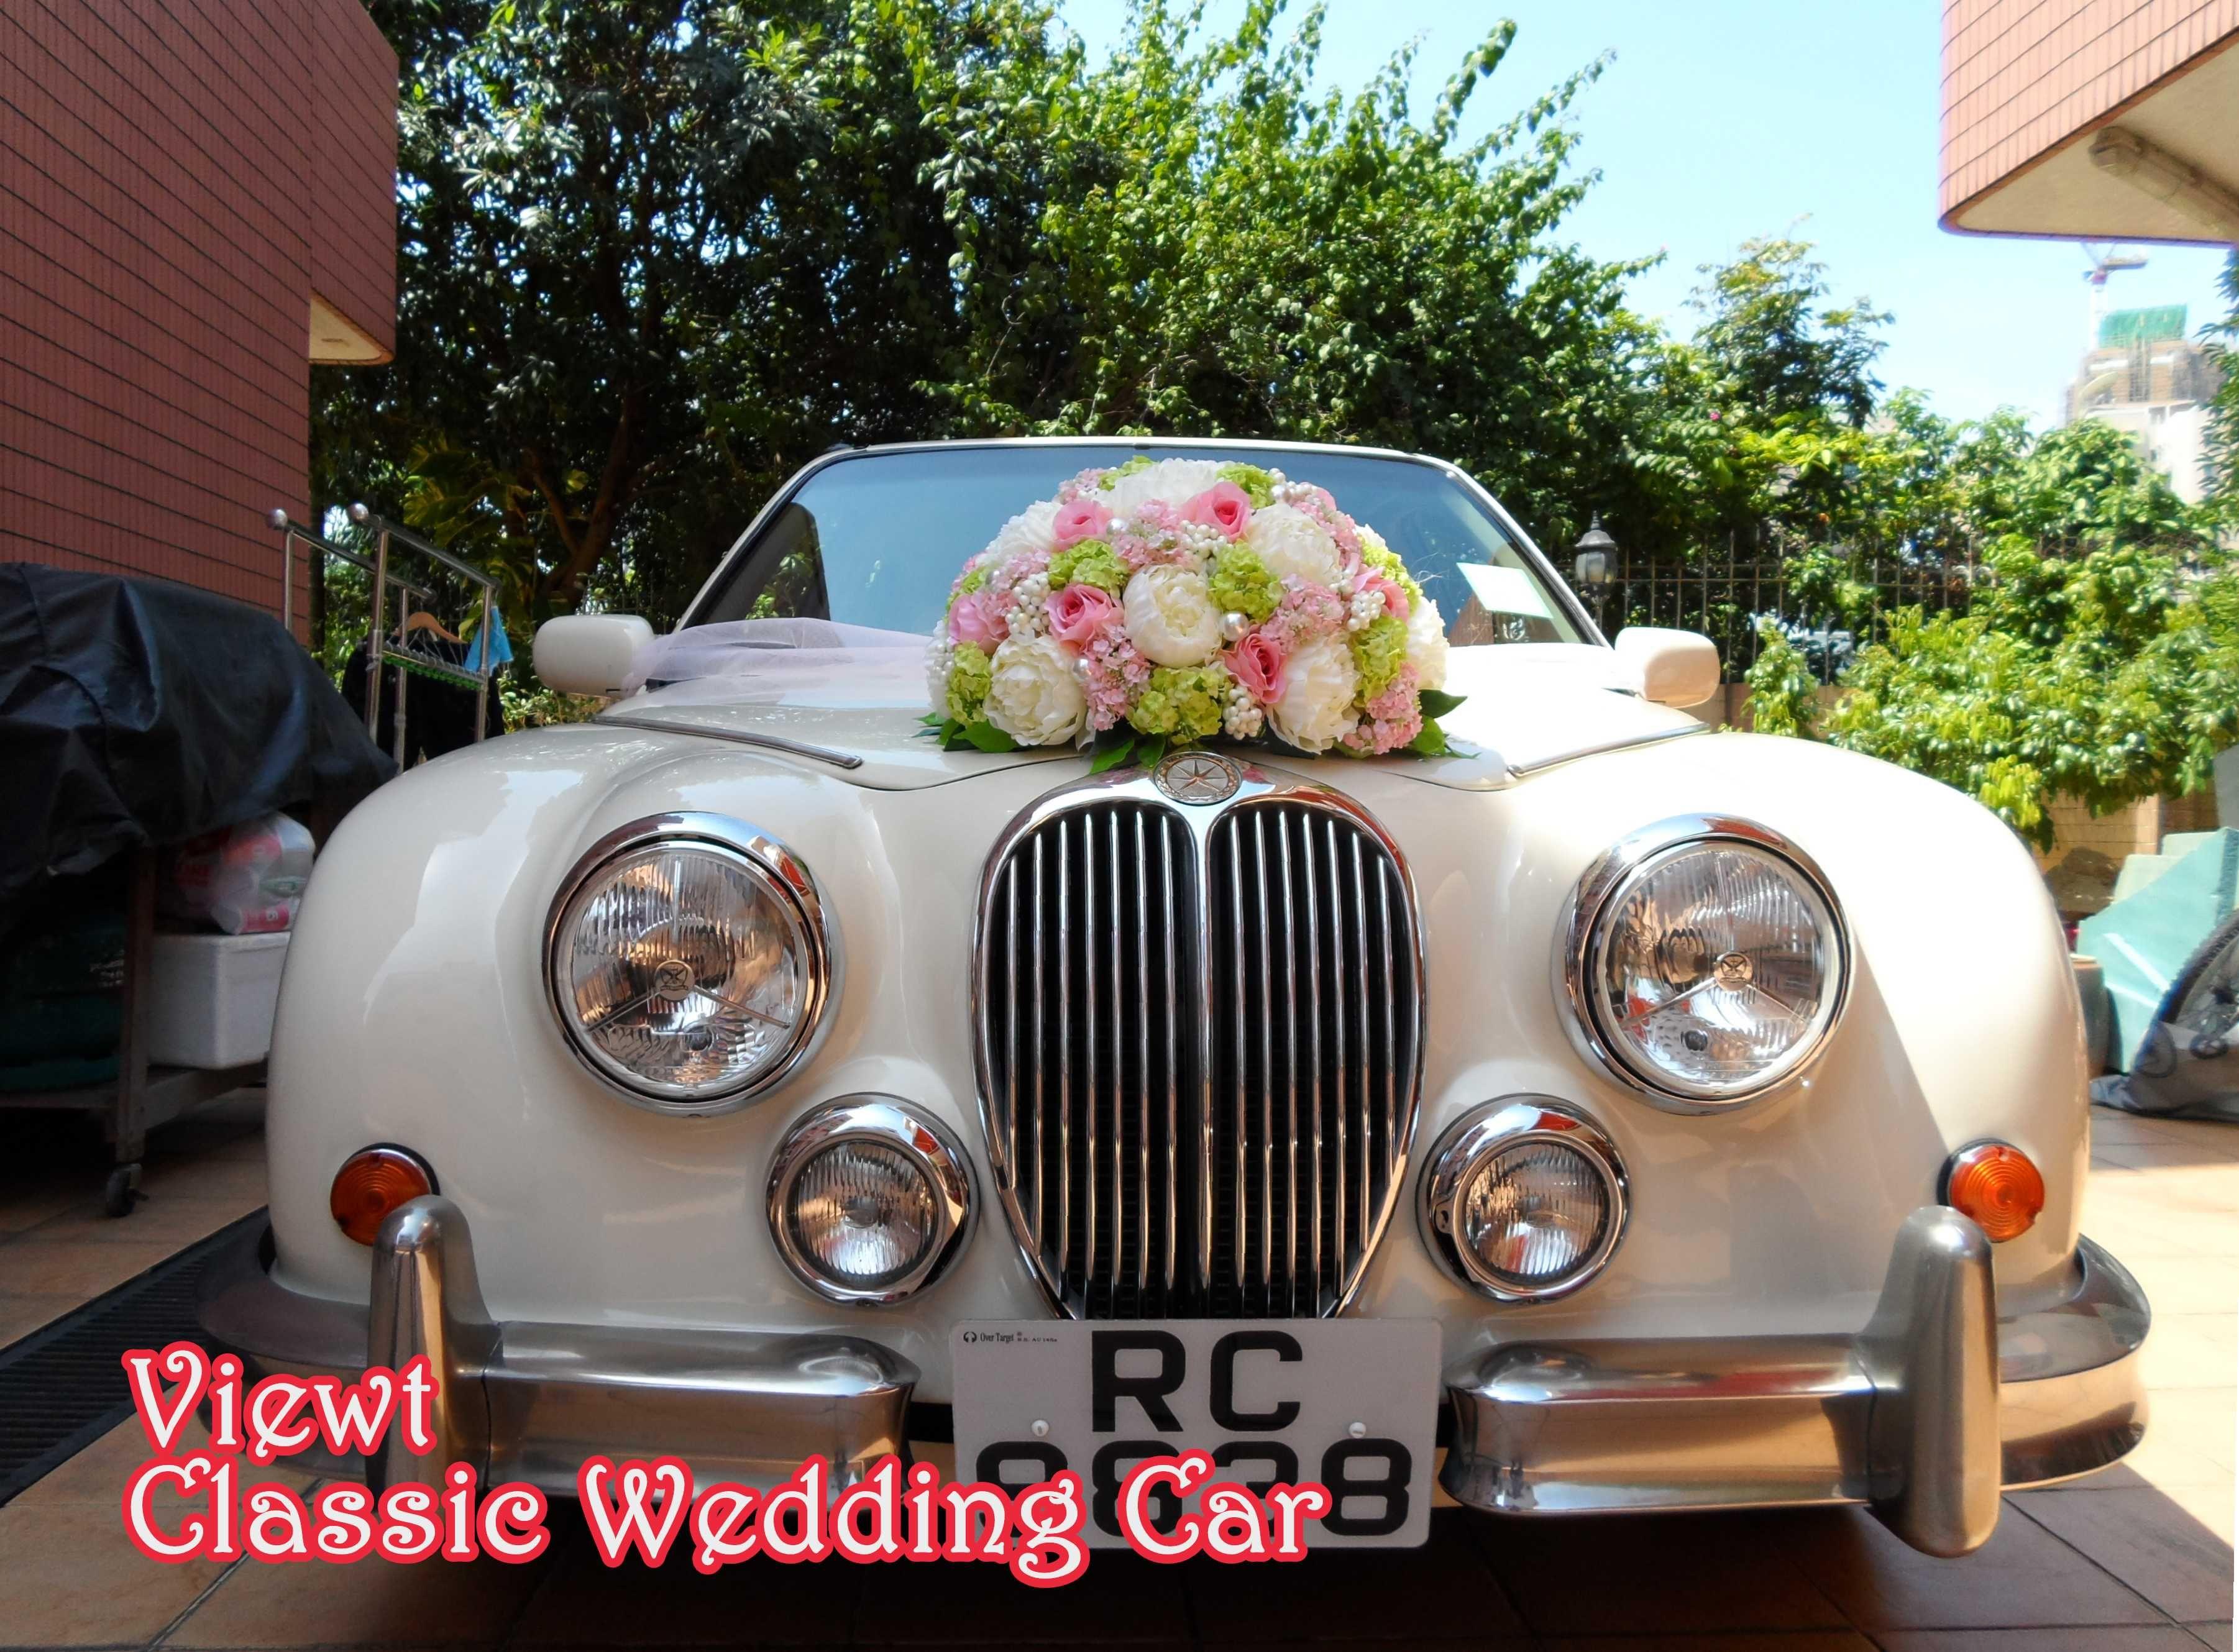 From Hong Kong Wedding Car Wedding Classic Wedding Car Car